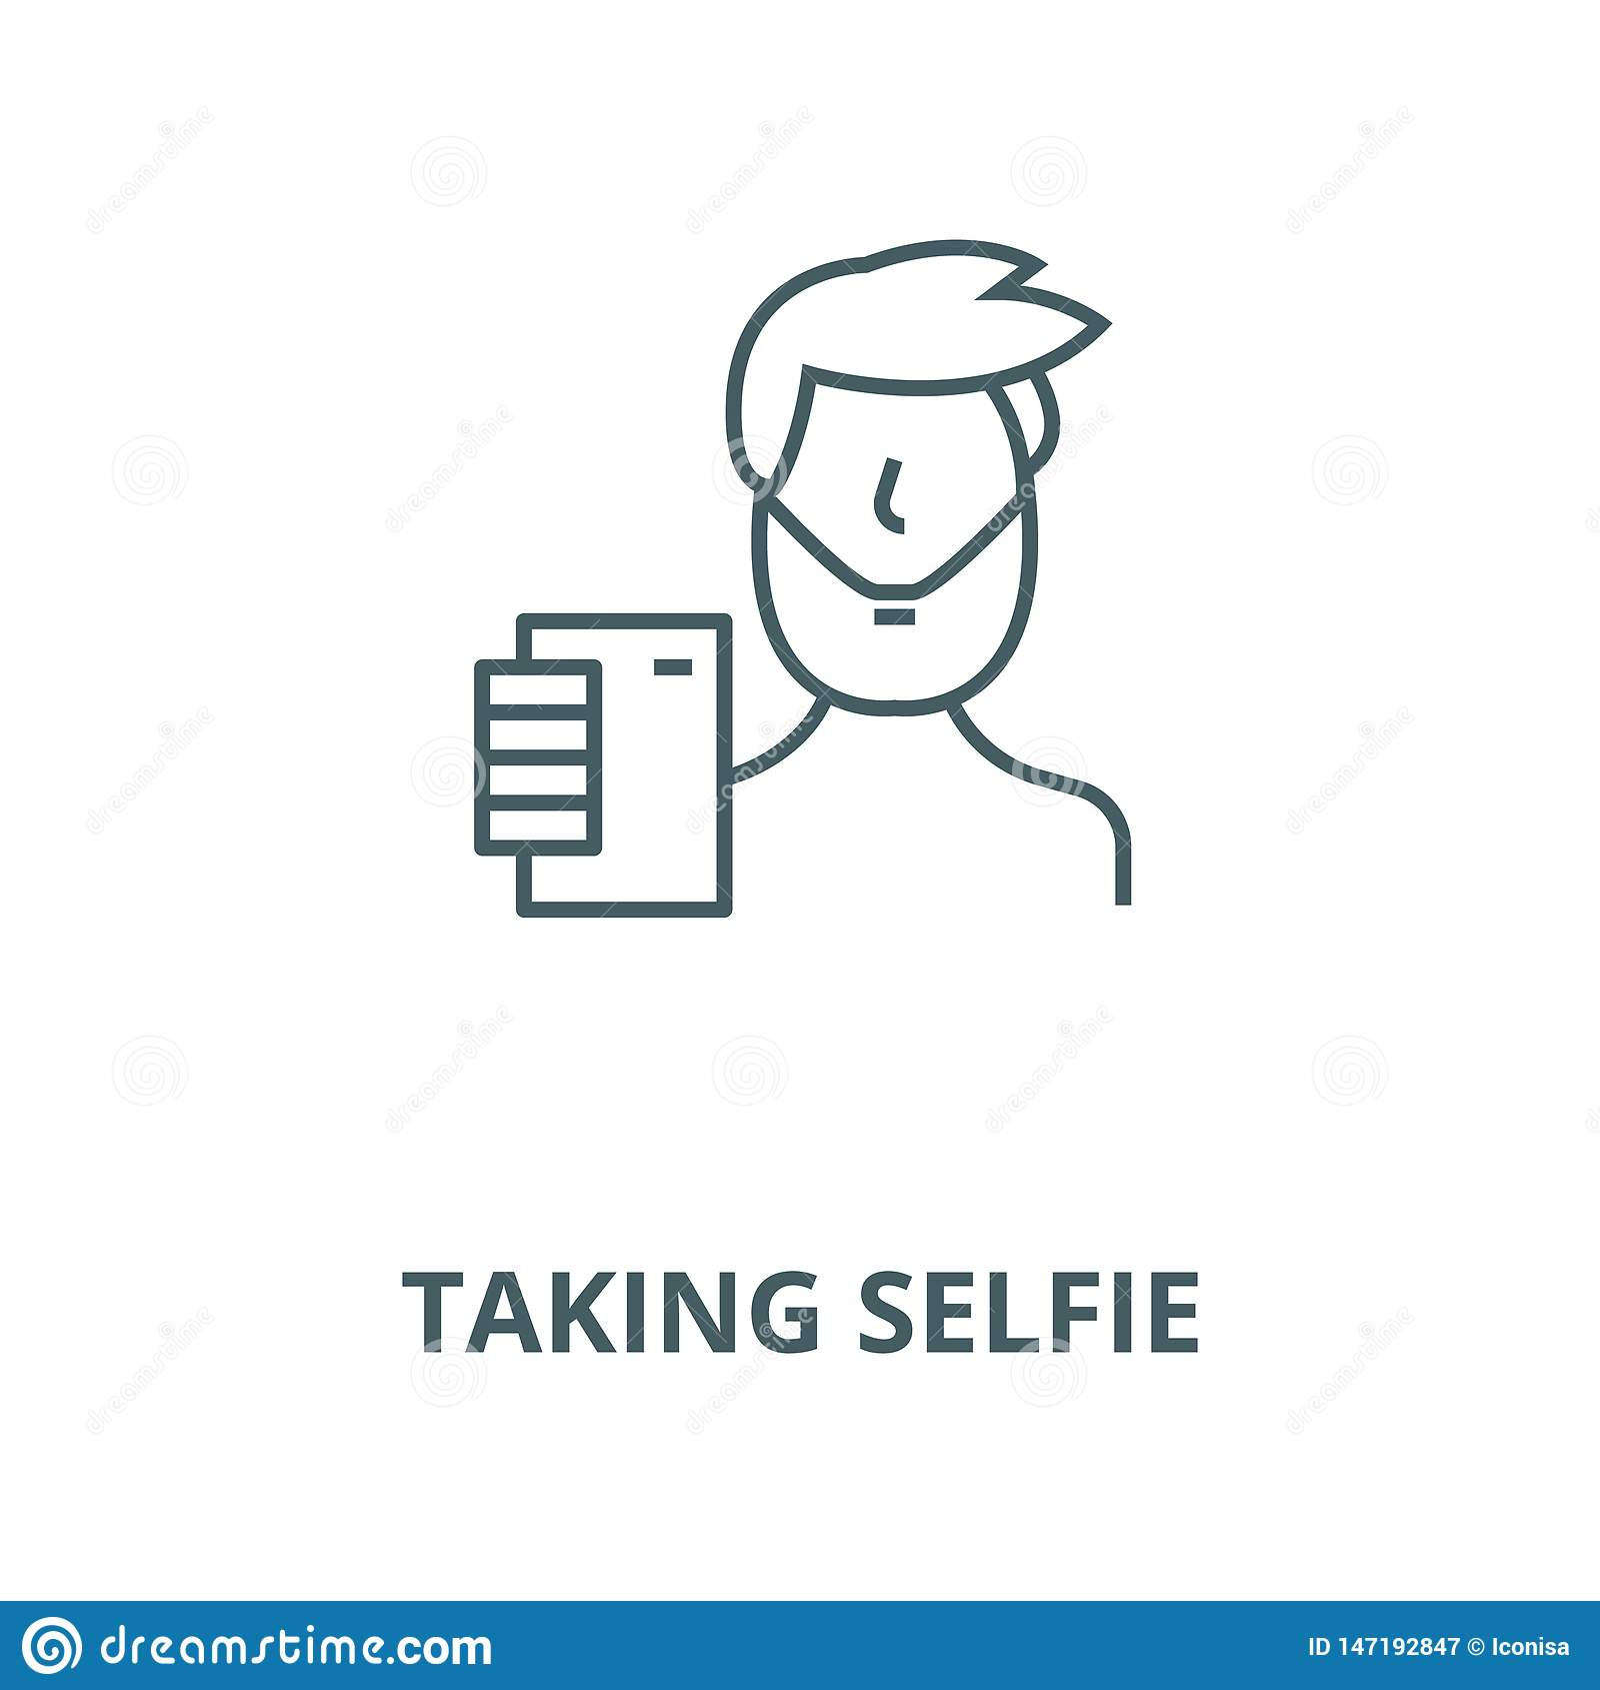 Taking selfie vector line icon, linear concept, outline sign, symbol